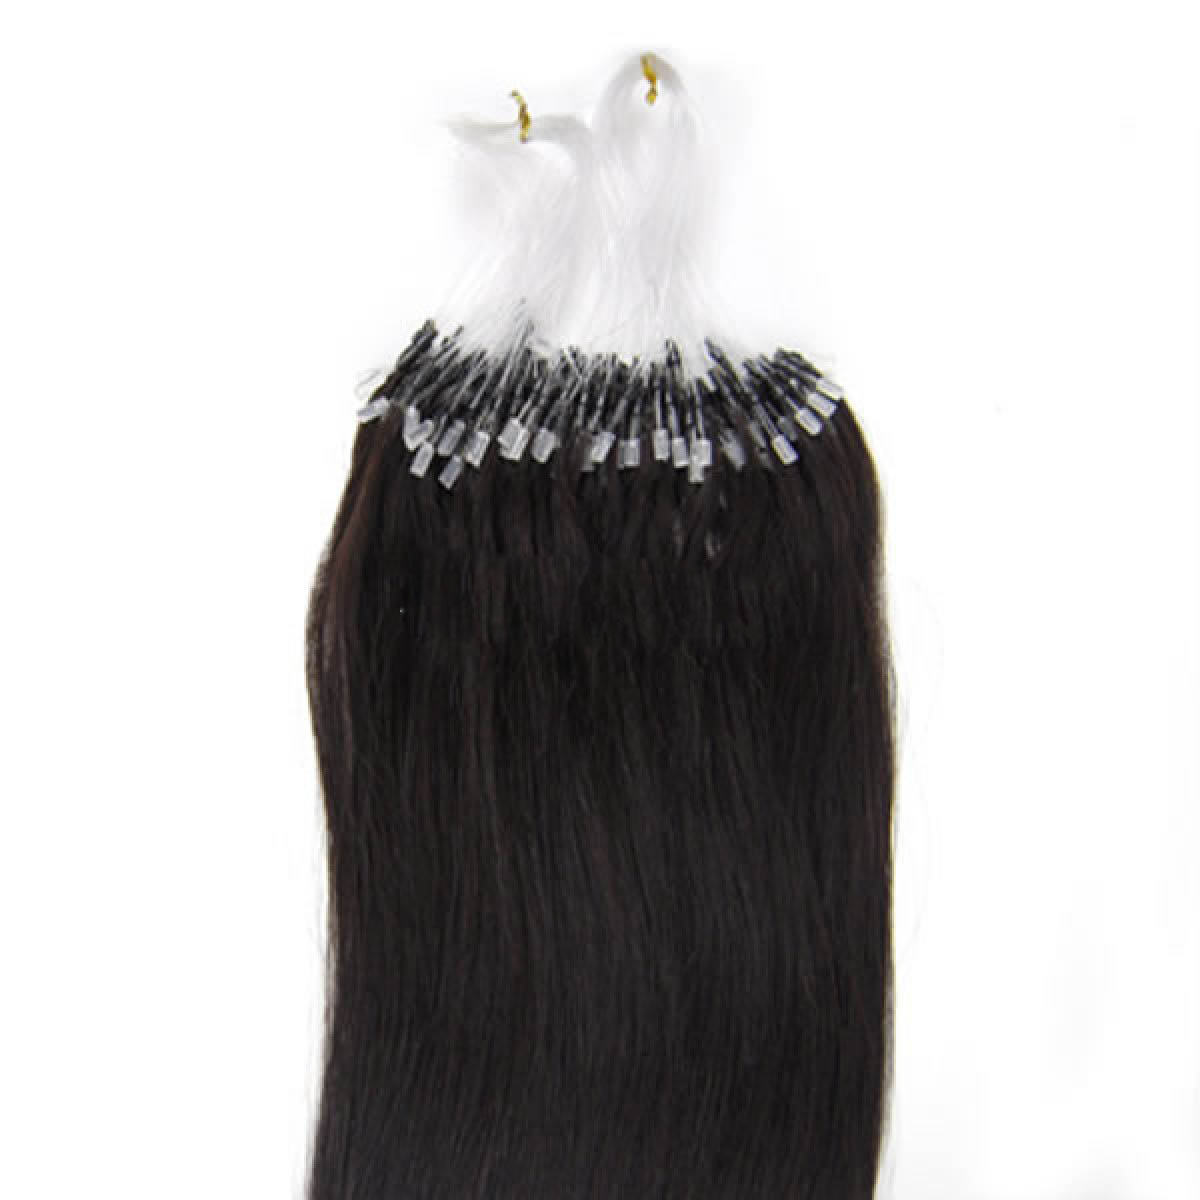 30 Inch 1b Natural Black Micro Loop Human Hair Extensions 100s 110g